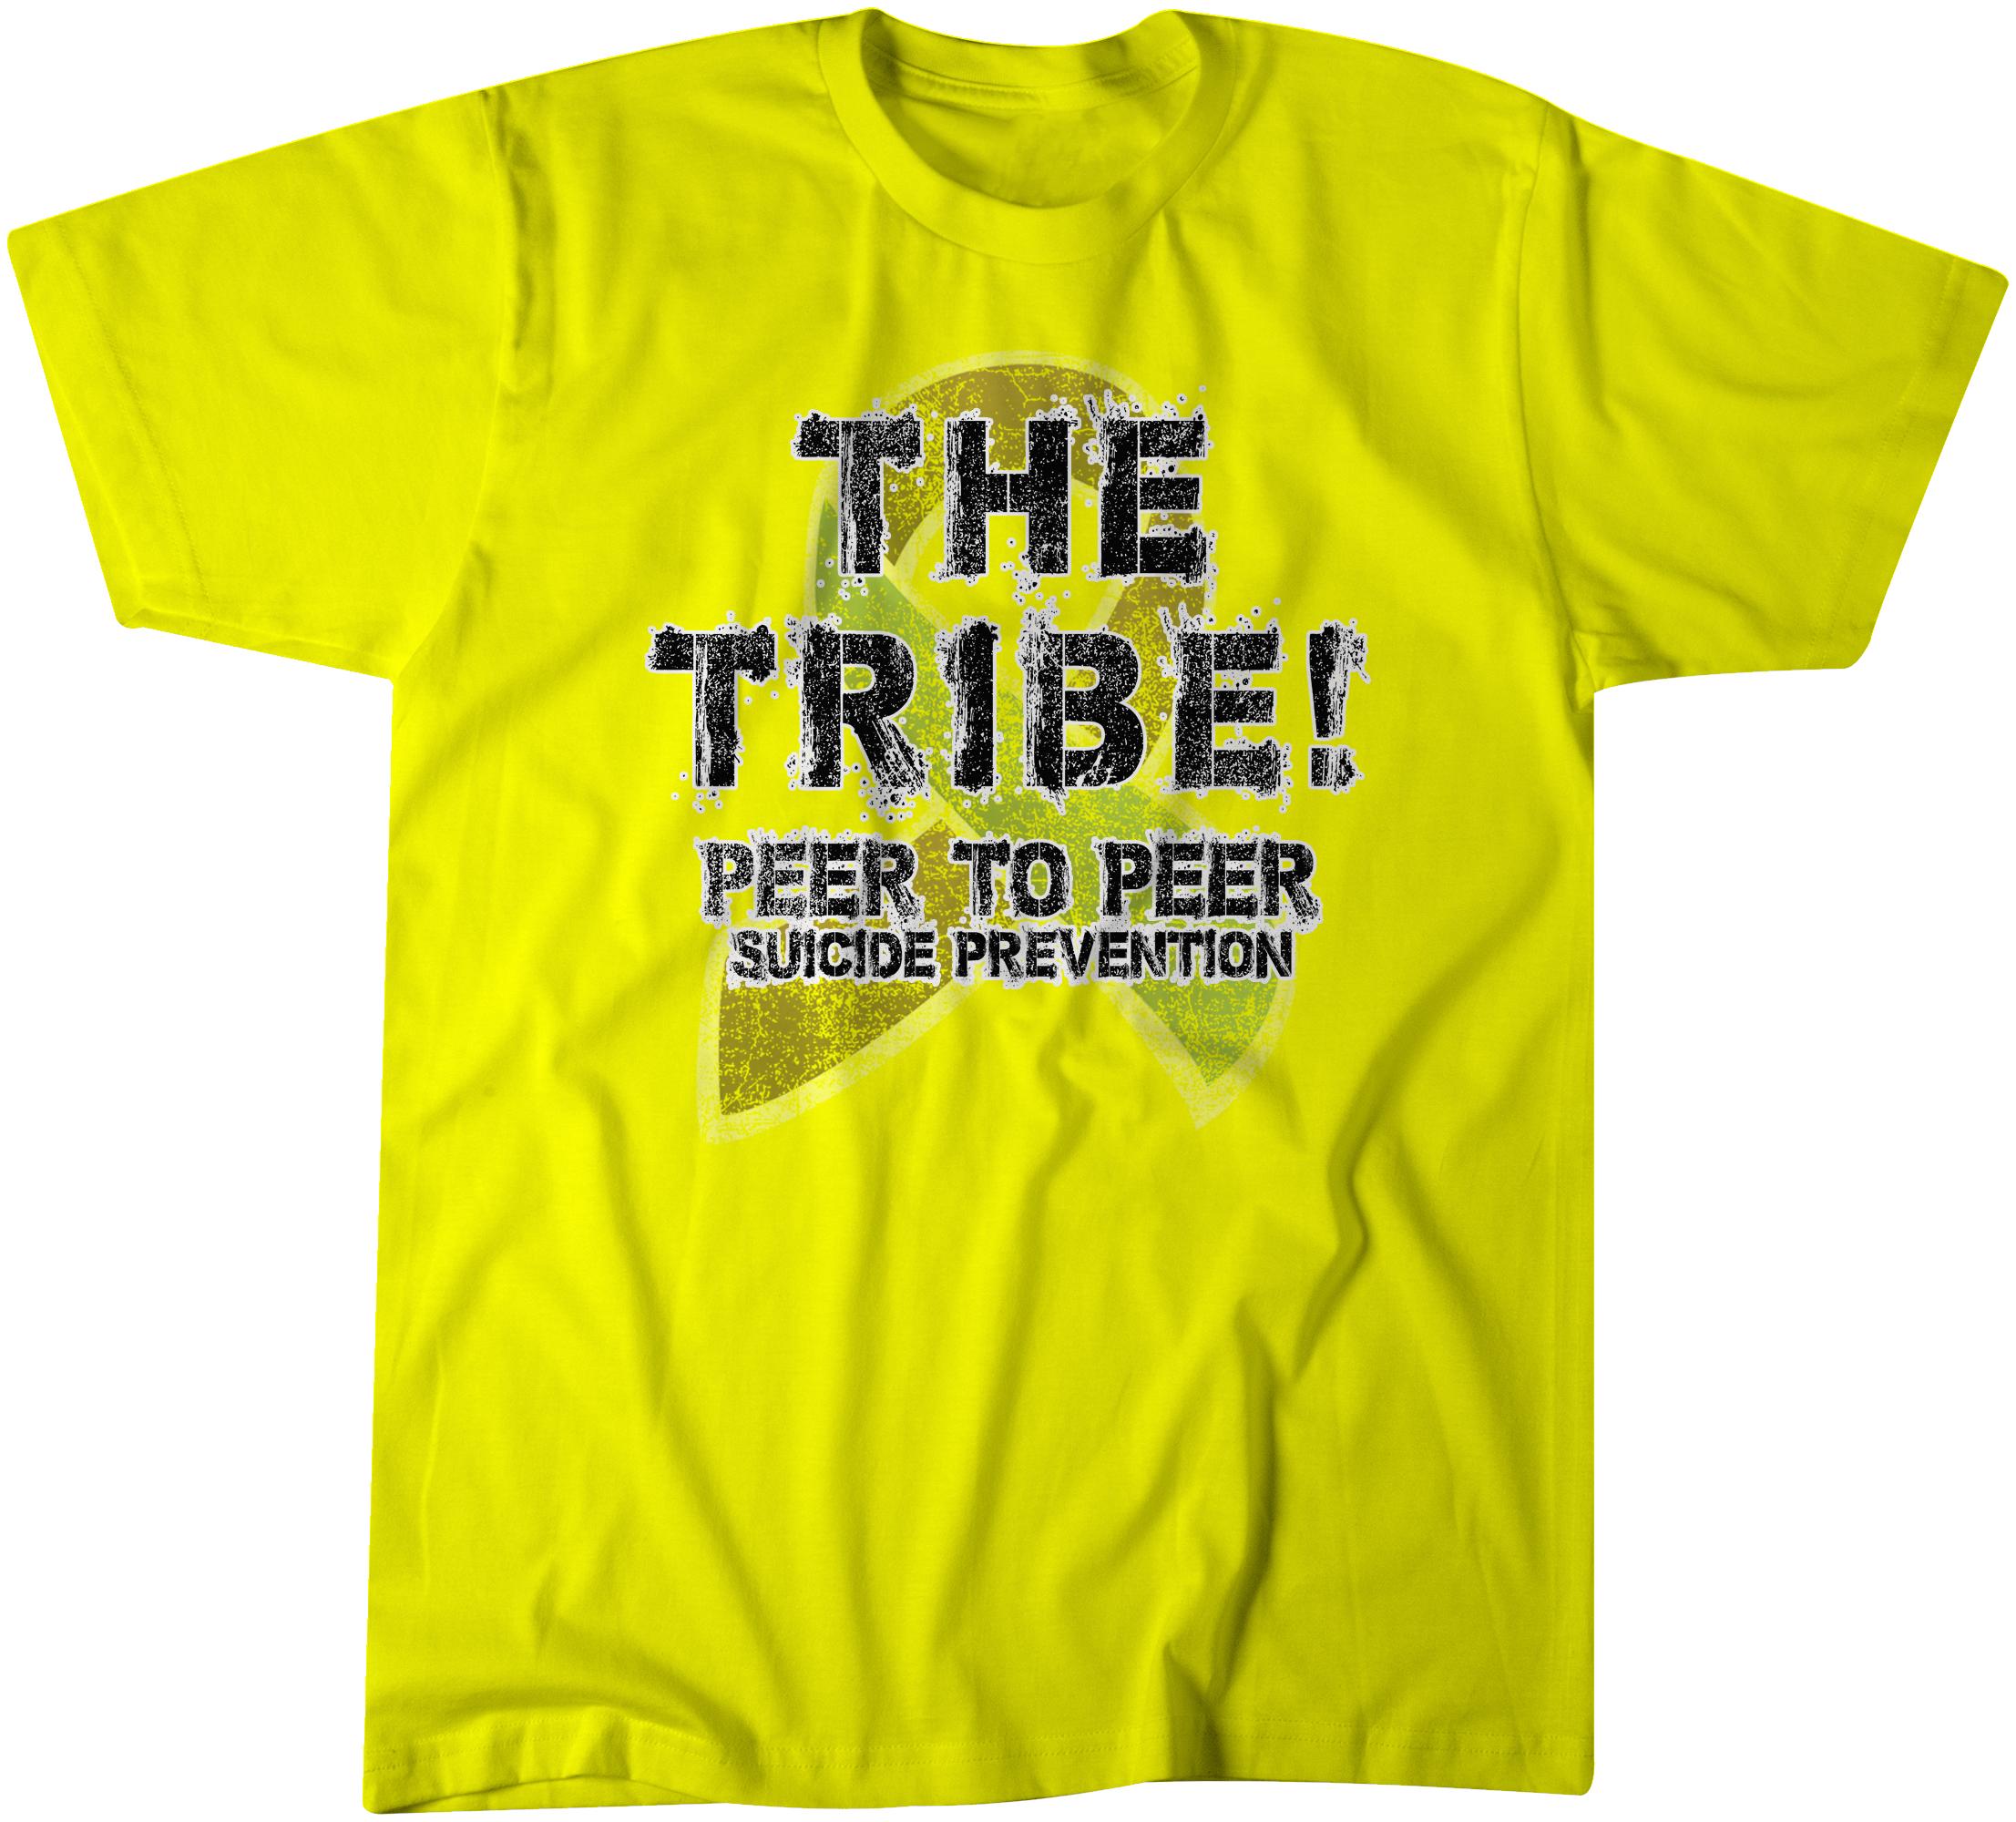 peer yellow-1.jpg